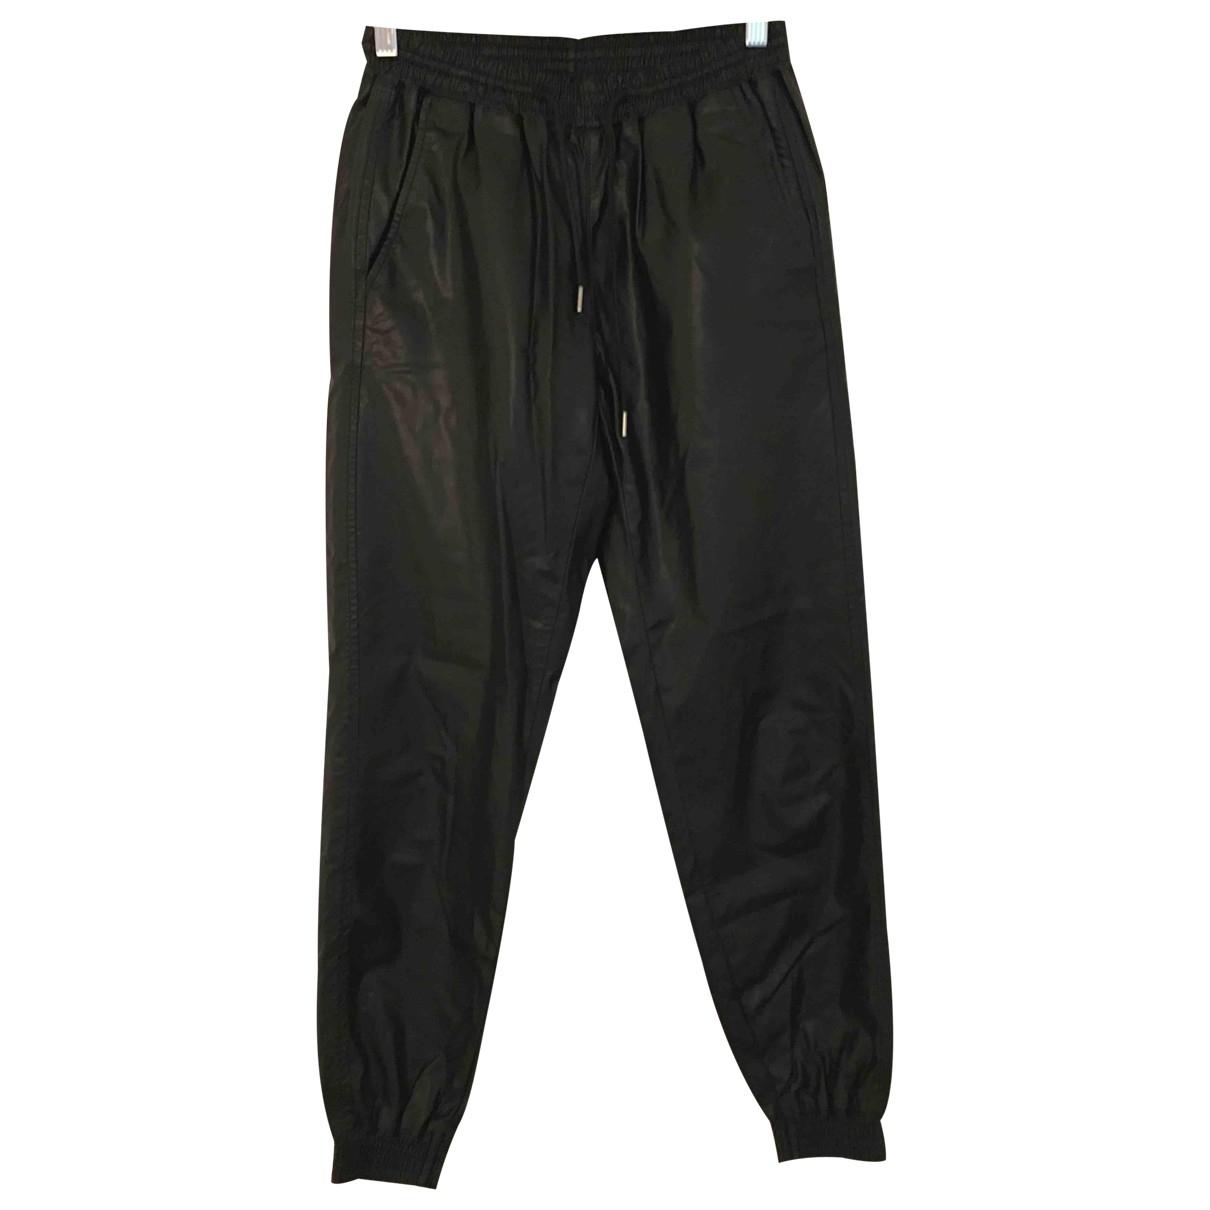 Zara \N Black Trousers for Women XS International